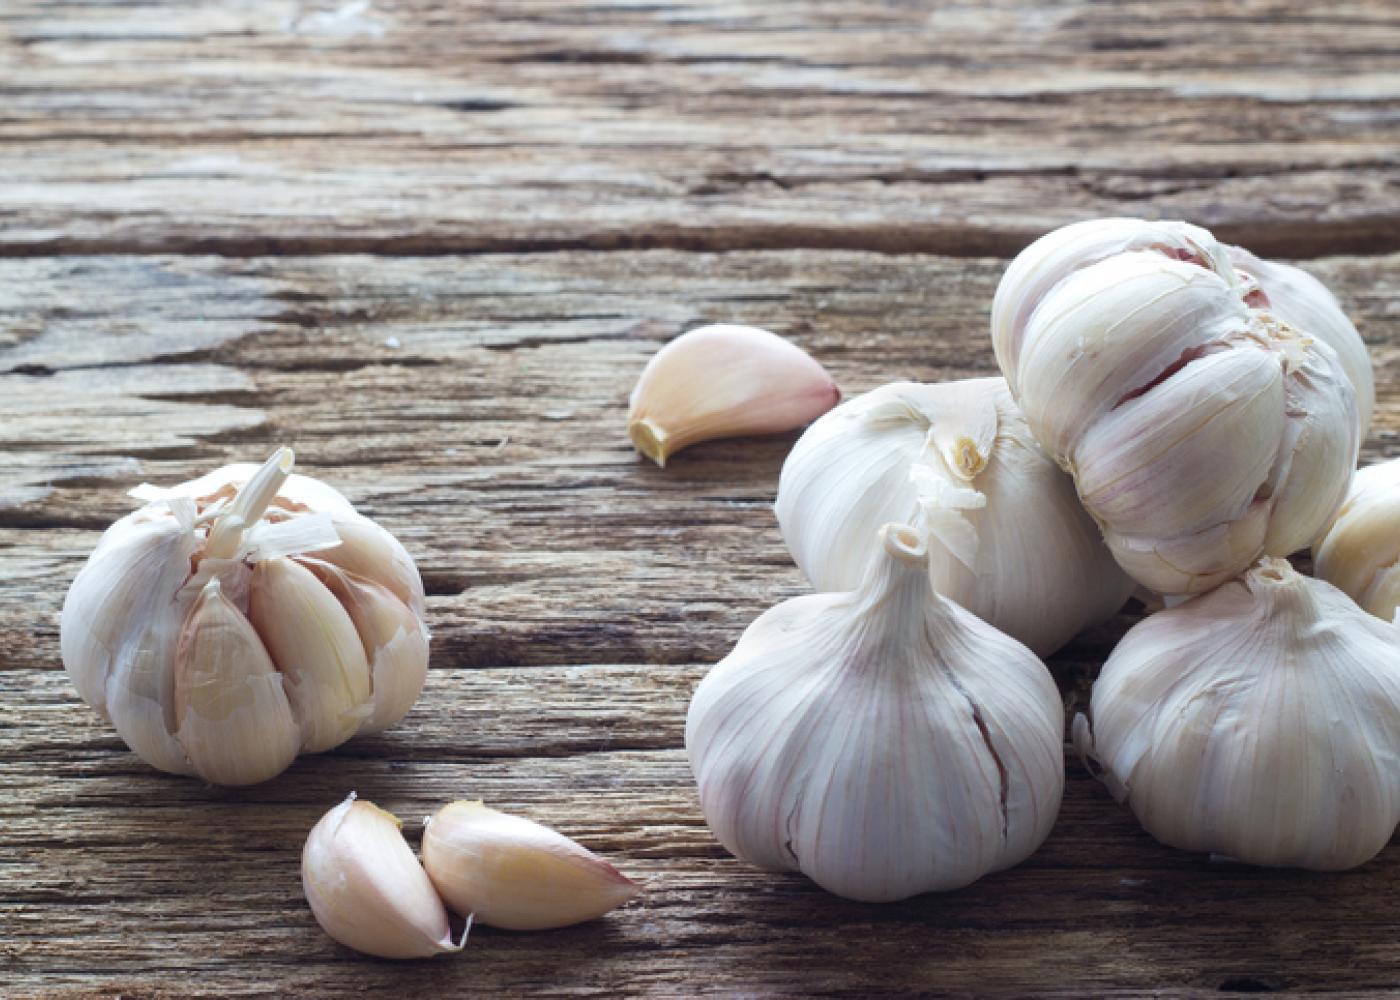 The Surprising Health Benefits of Garlic